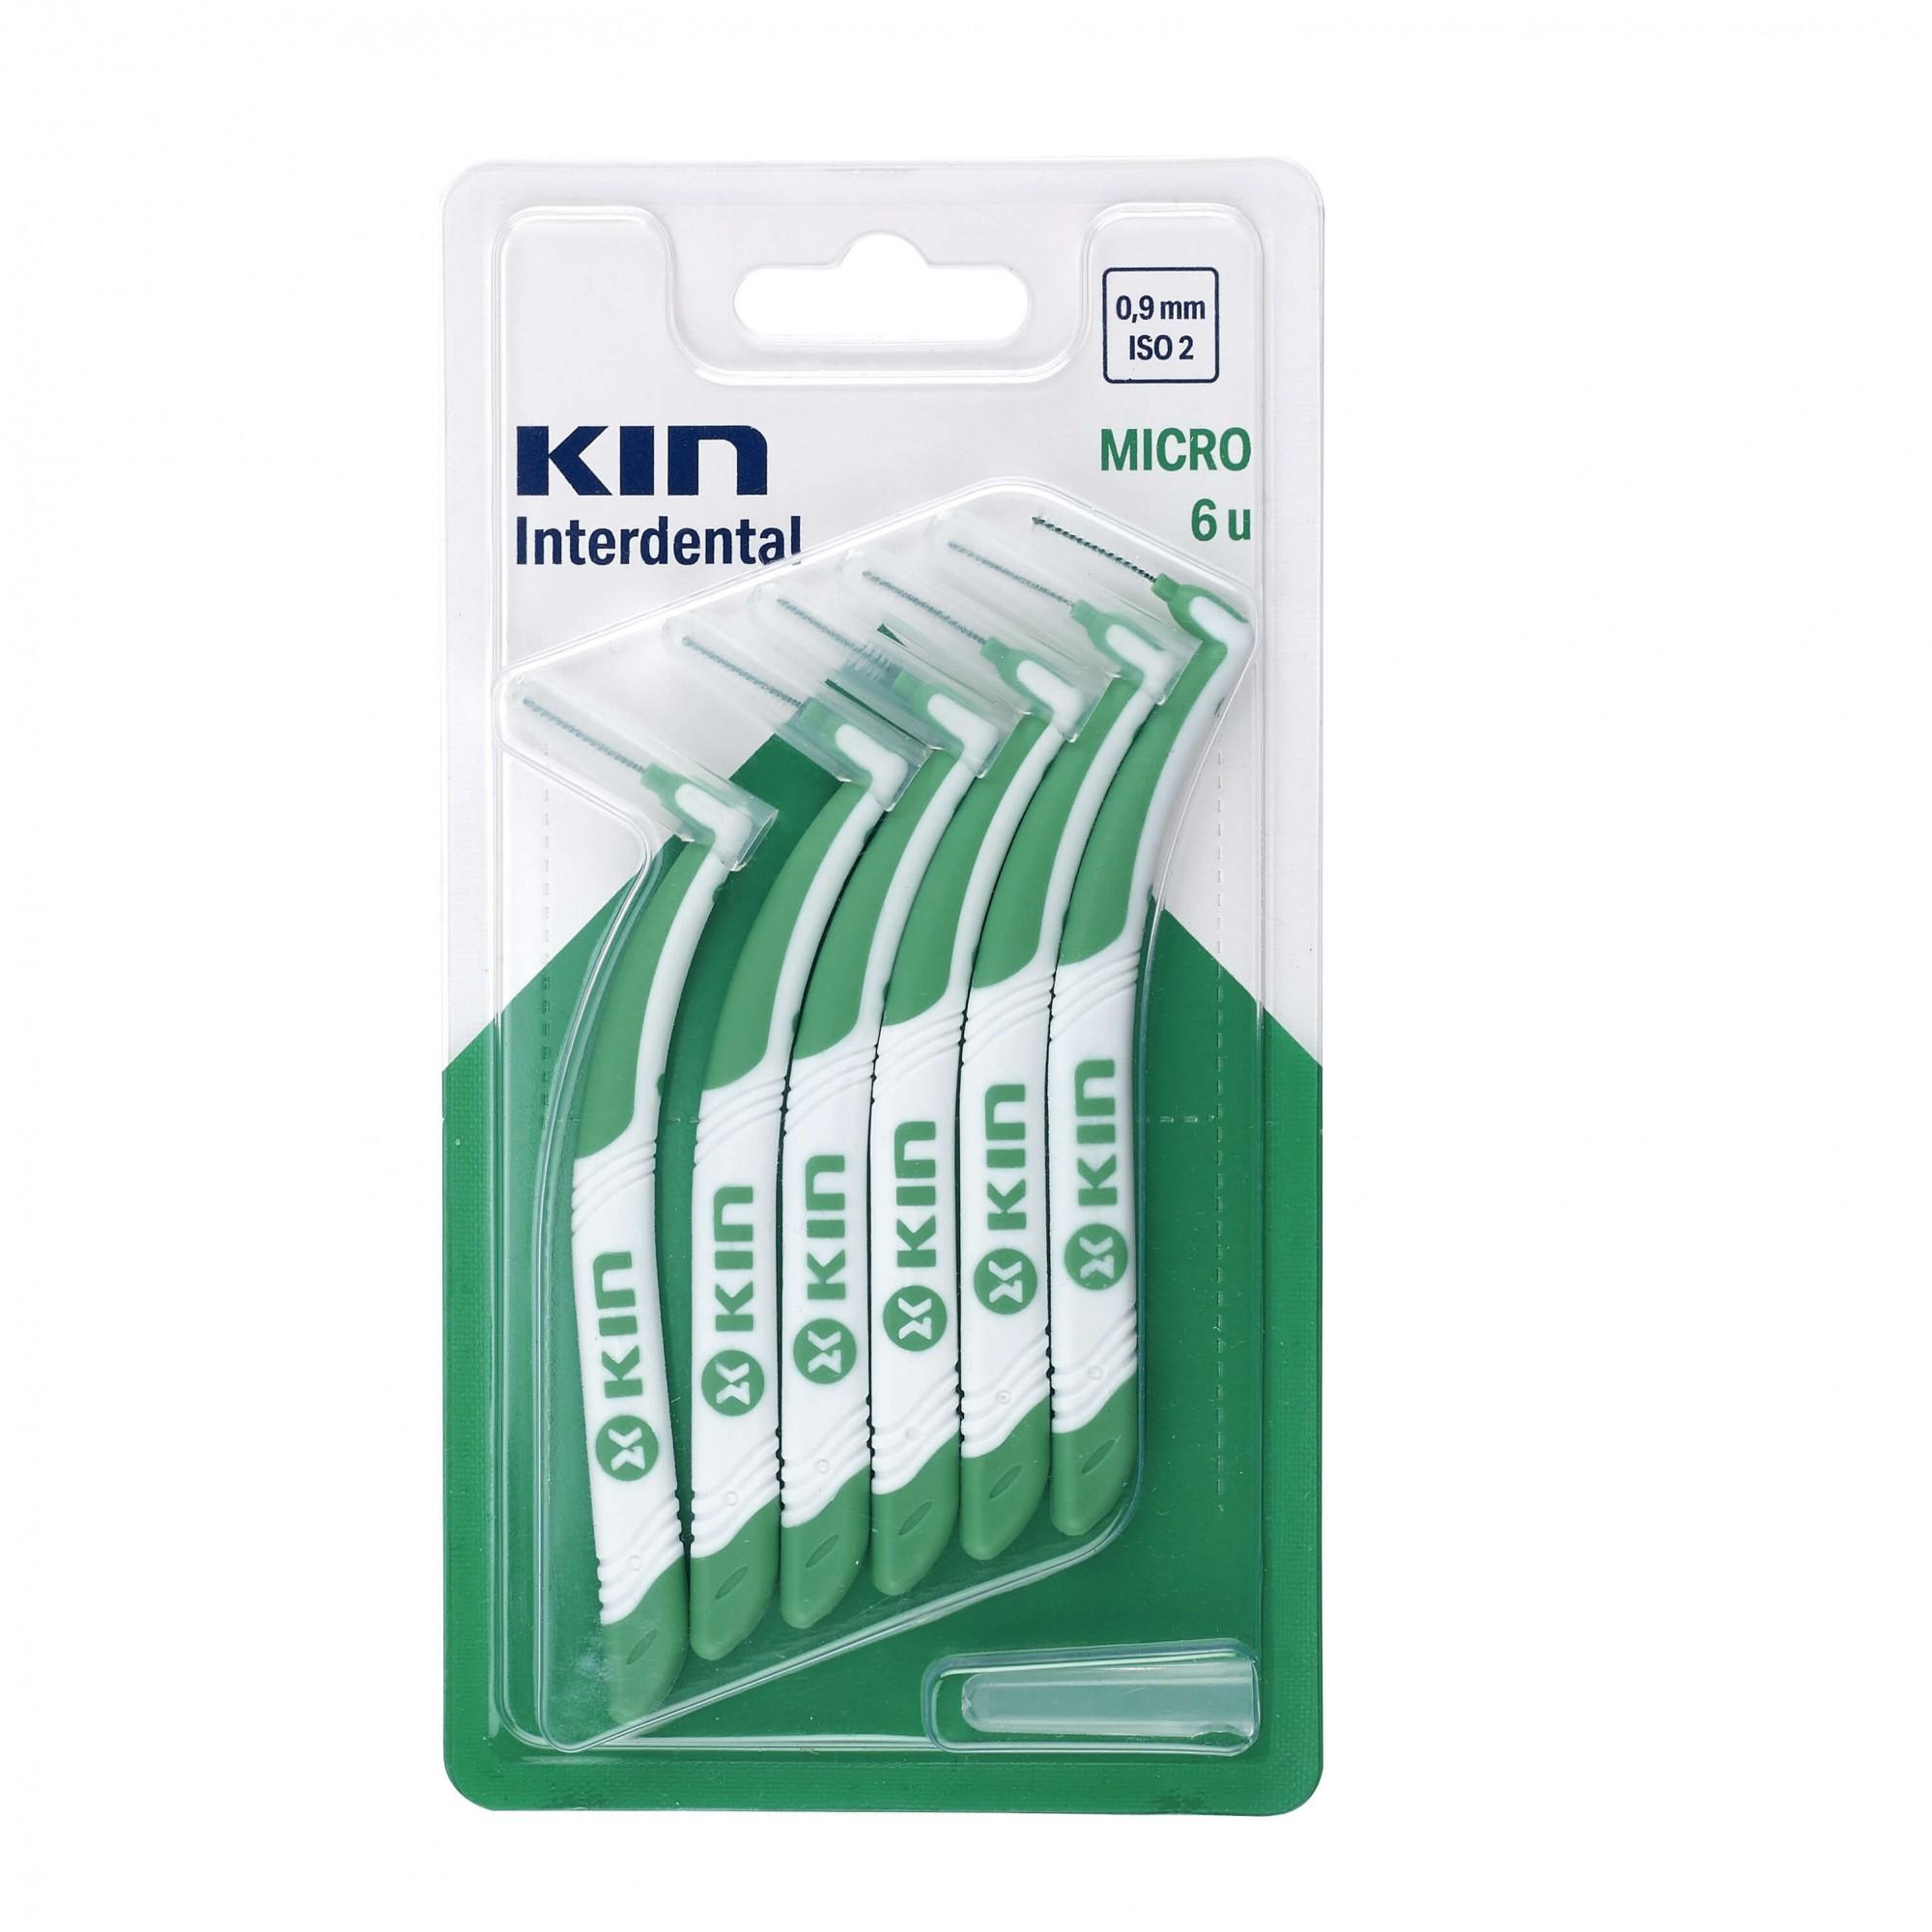 Escova Kin Interdentária Micro (0,9mm - ISO2) - verde